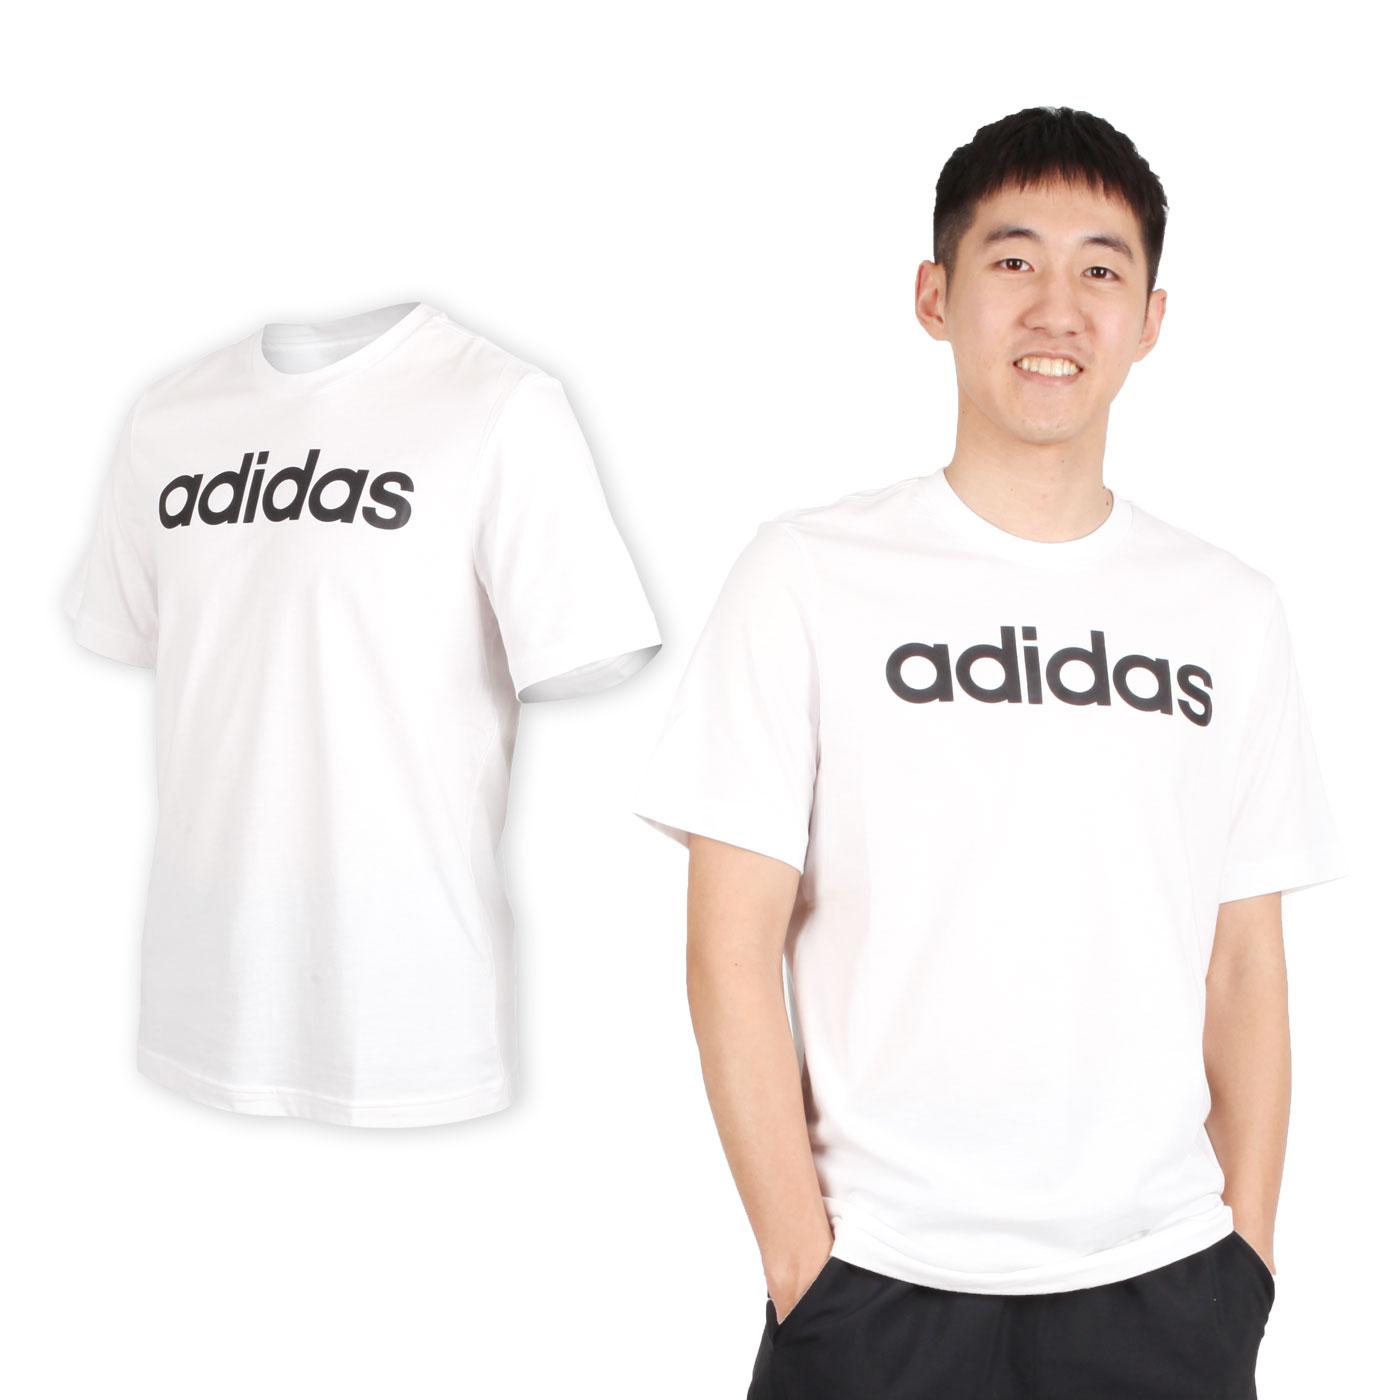 ADIDAS 男款短袖圓領T恤 DQ3056 - 白黑